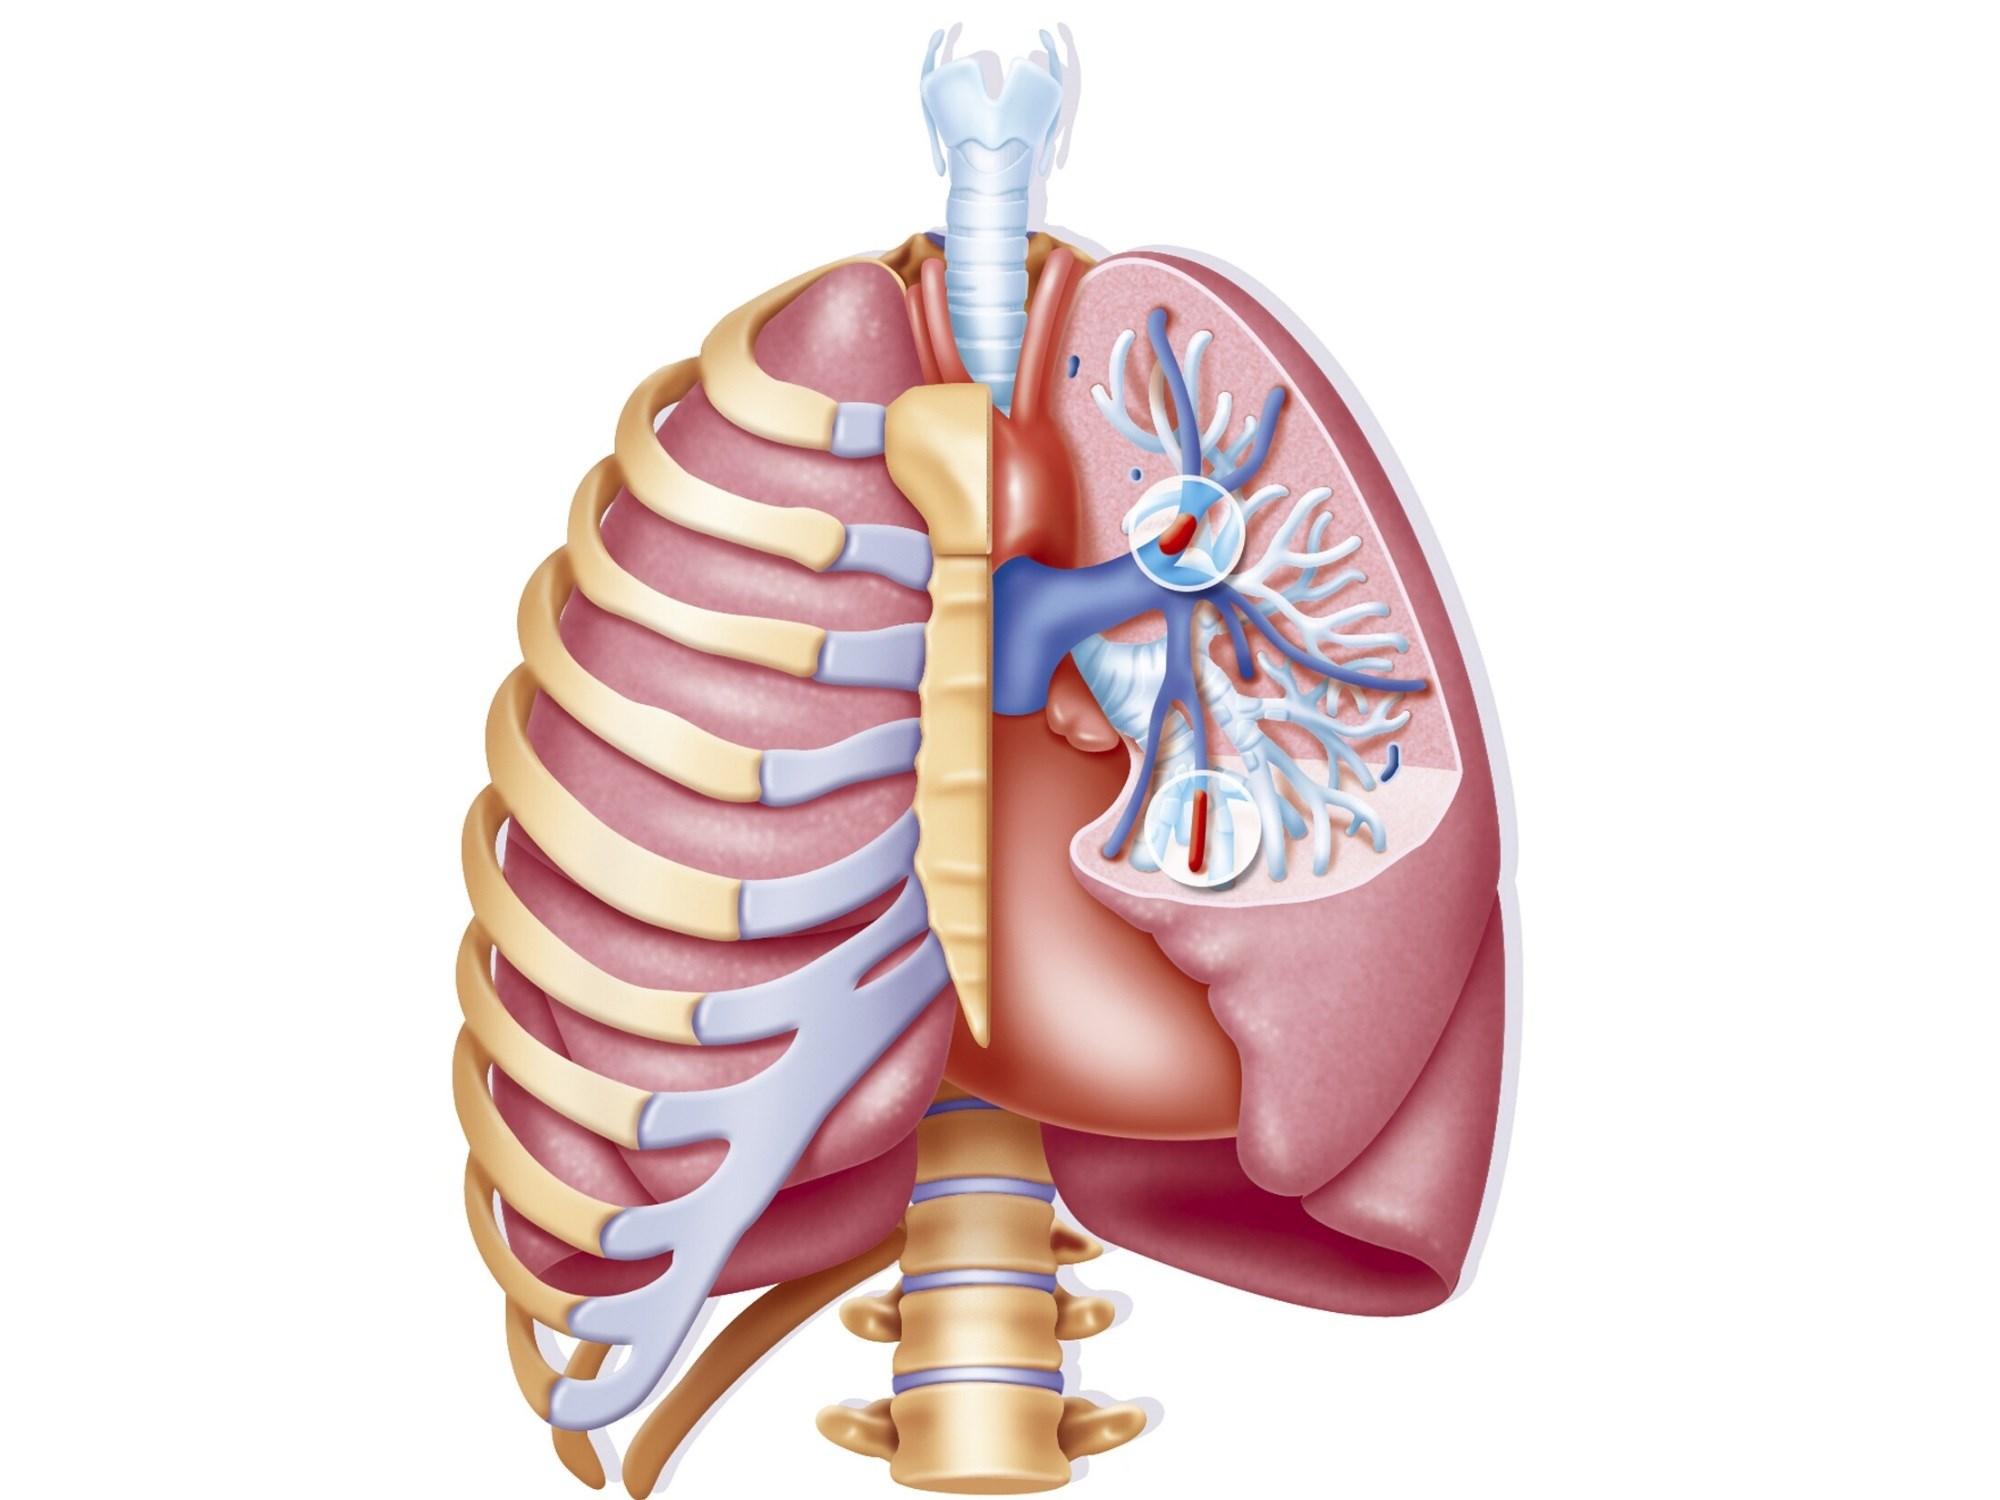 Trauma-Induced Pulmonary Embolism: A Clinical Case